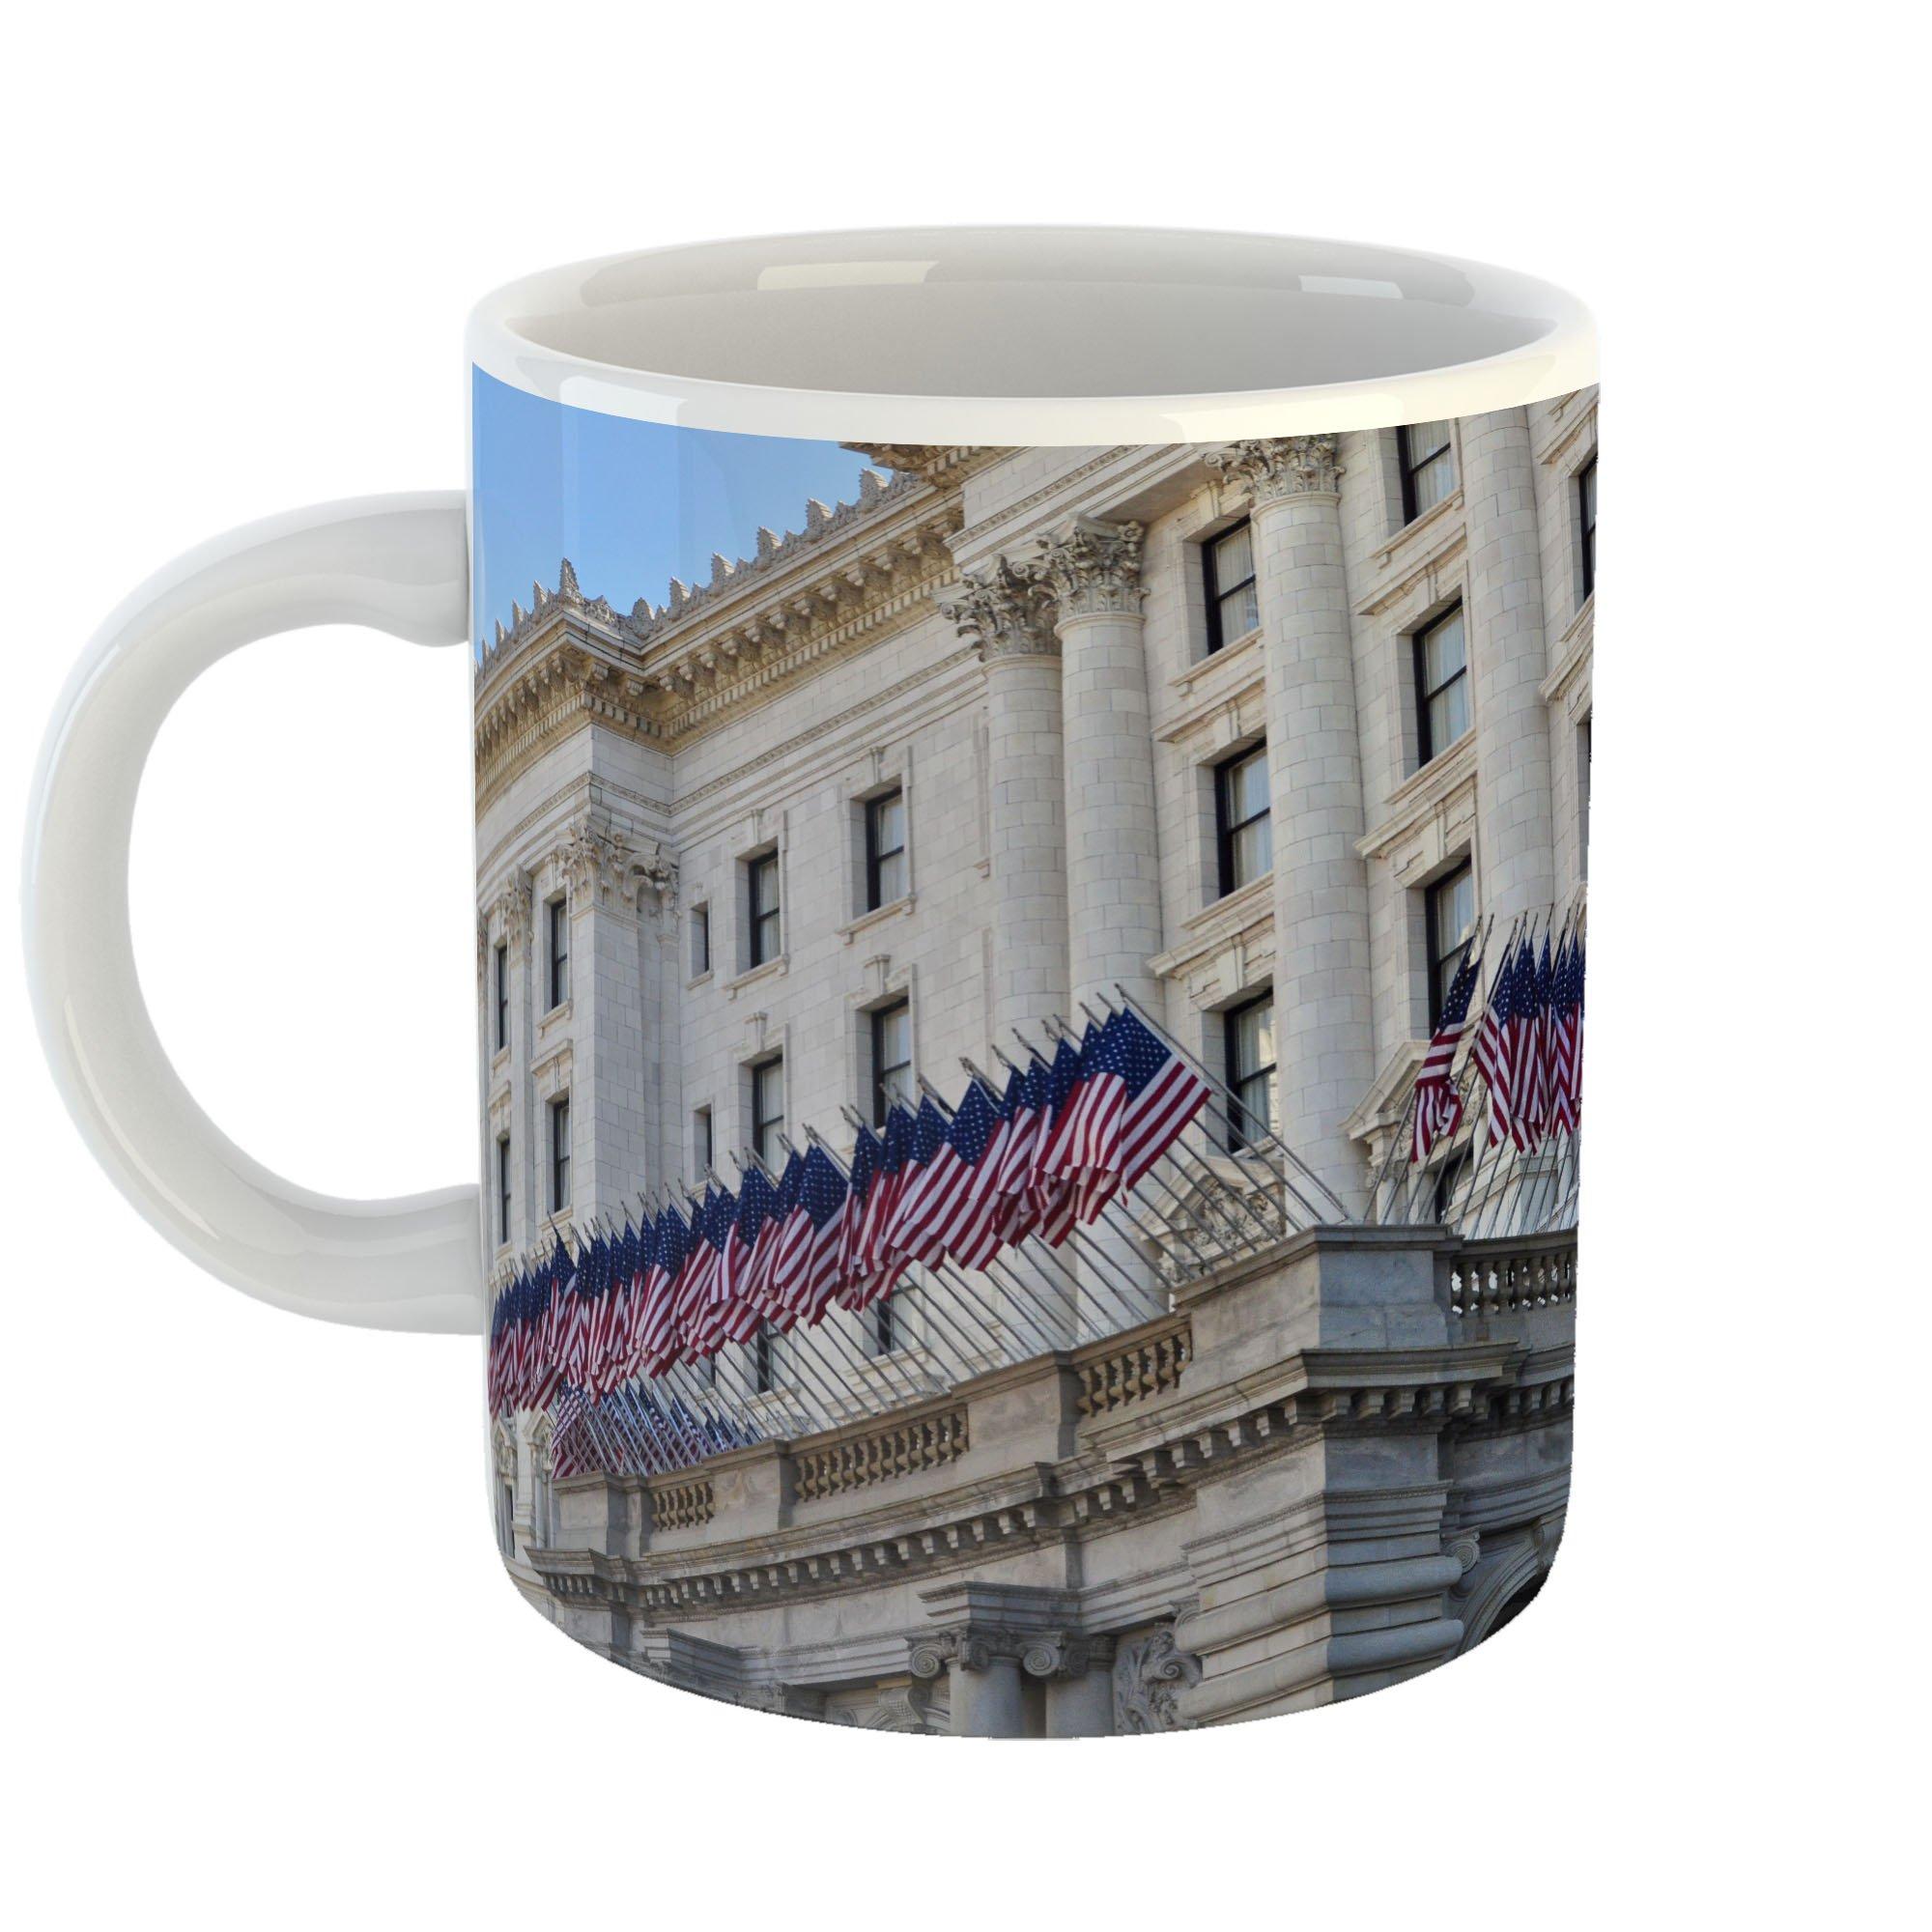 Westlake Art - Flag Hotel - 11oz Coffee Cup Mug - Modern Picture Photography Artwork Home Office Birthday Gift - 11 Ounce (8CDF-B0E71)